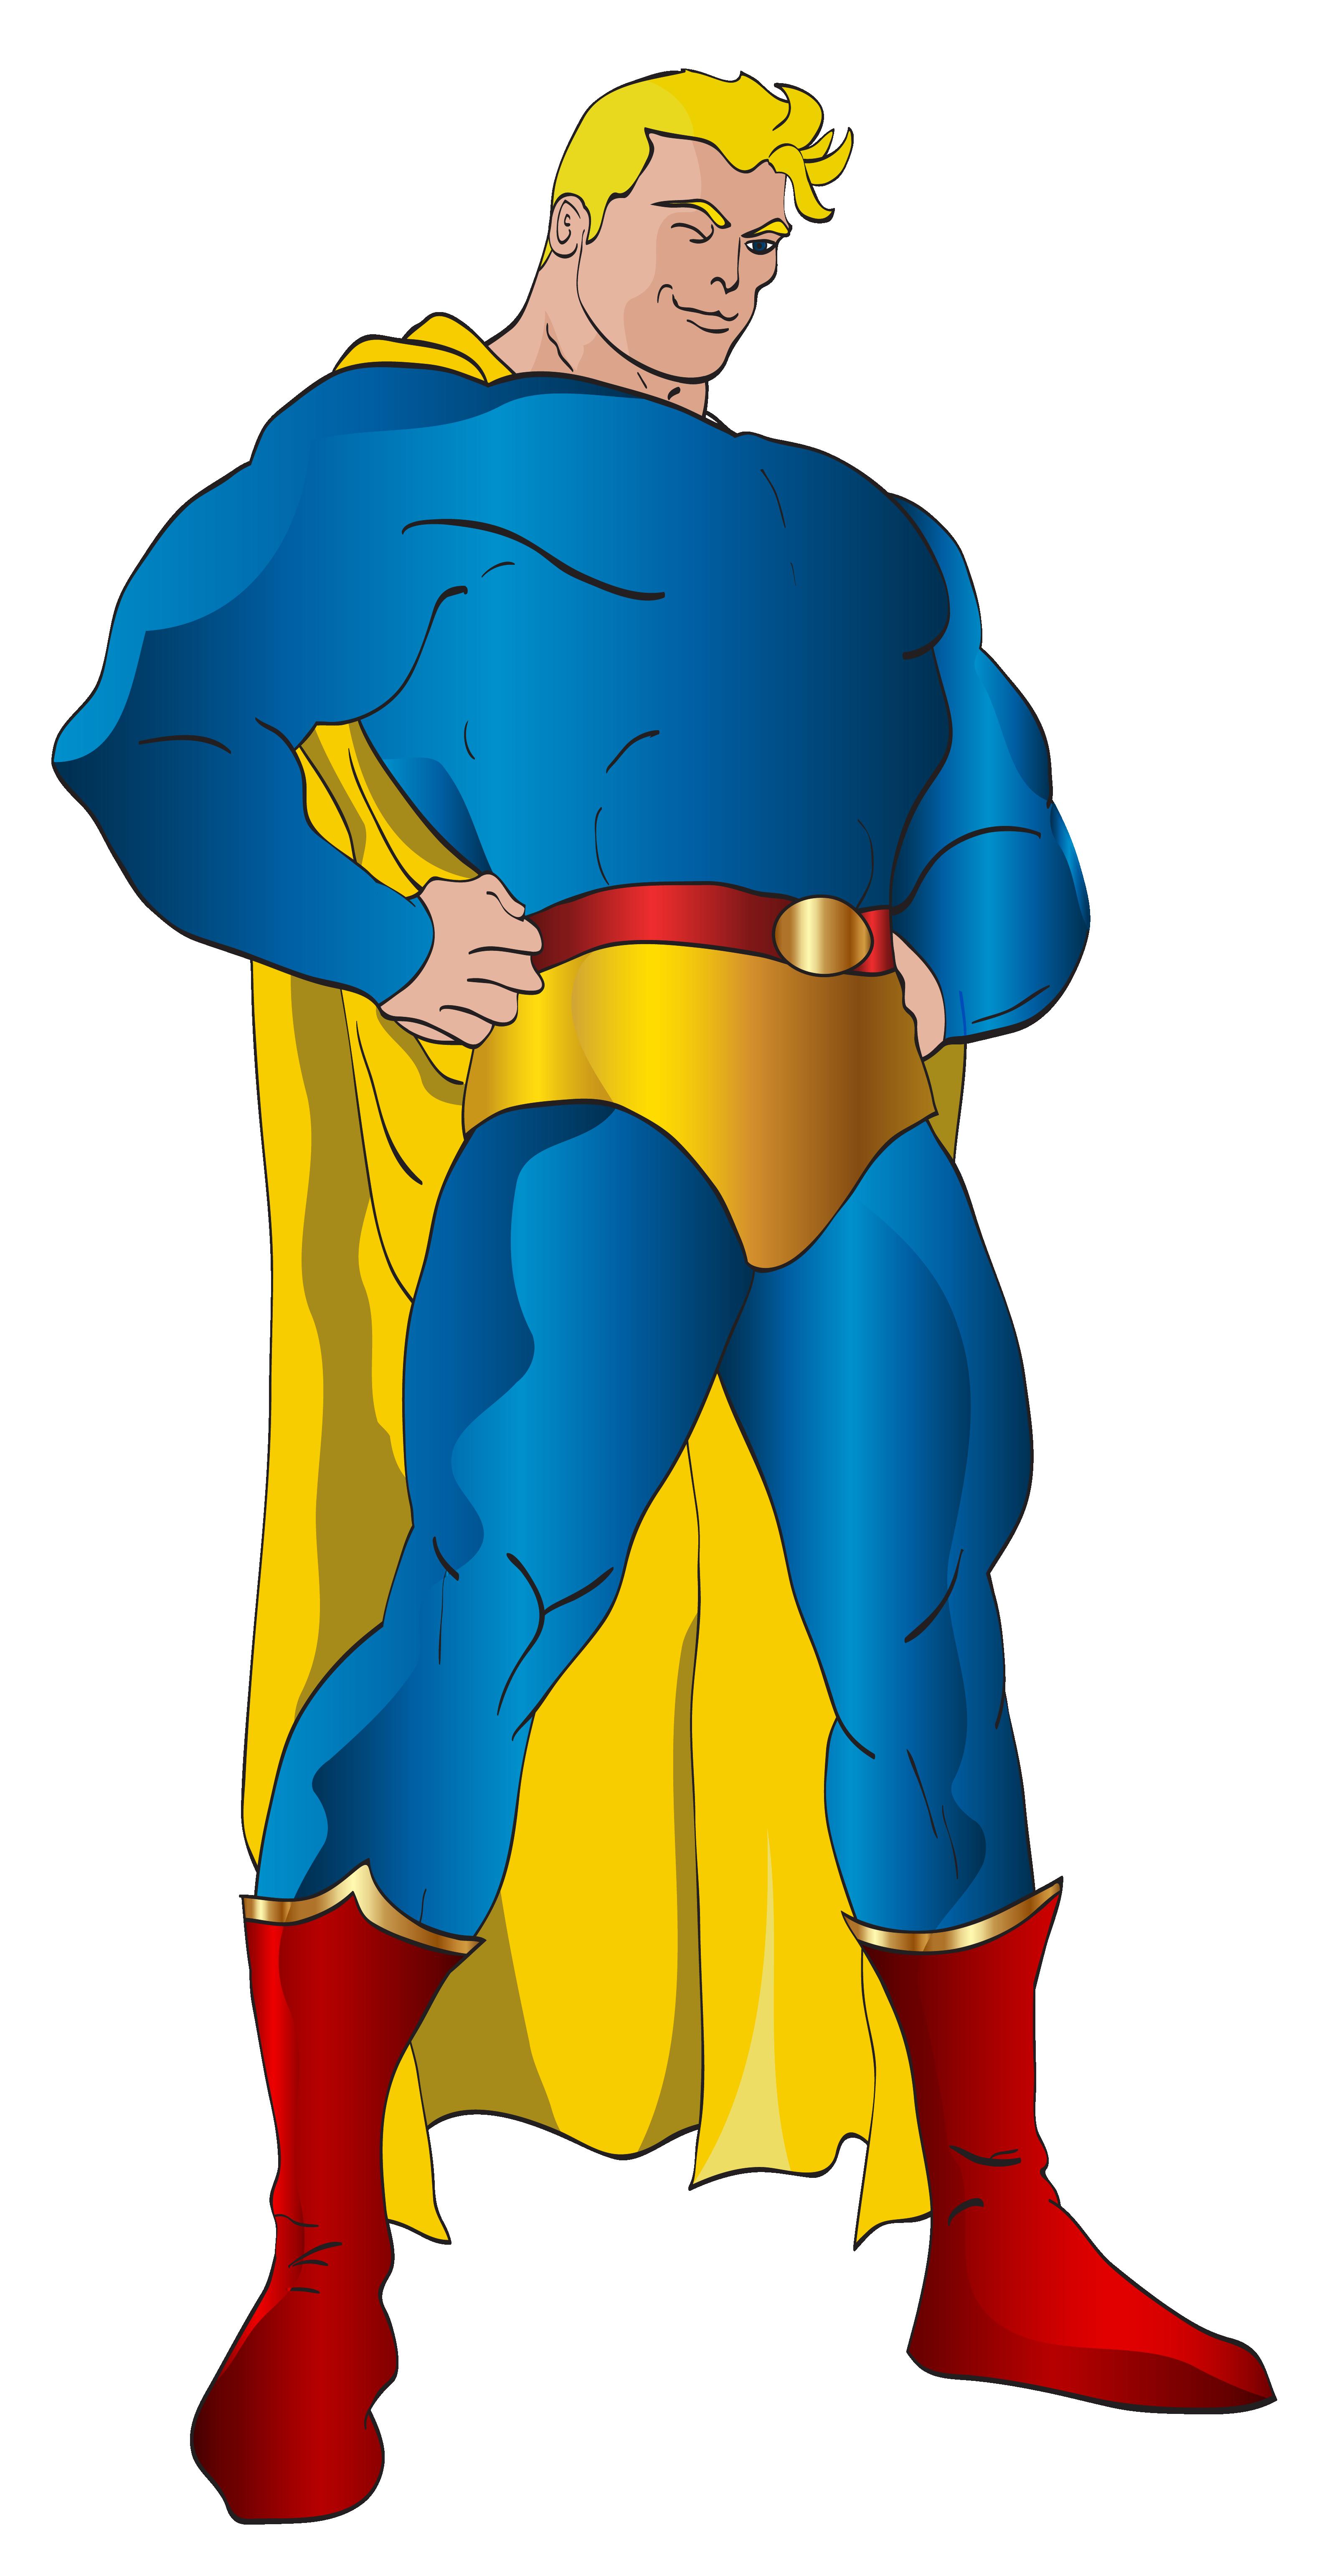 Png clip art image. Costume clipart superhero costume